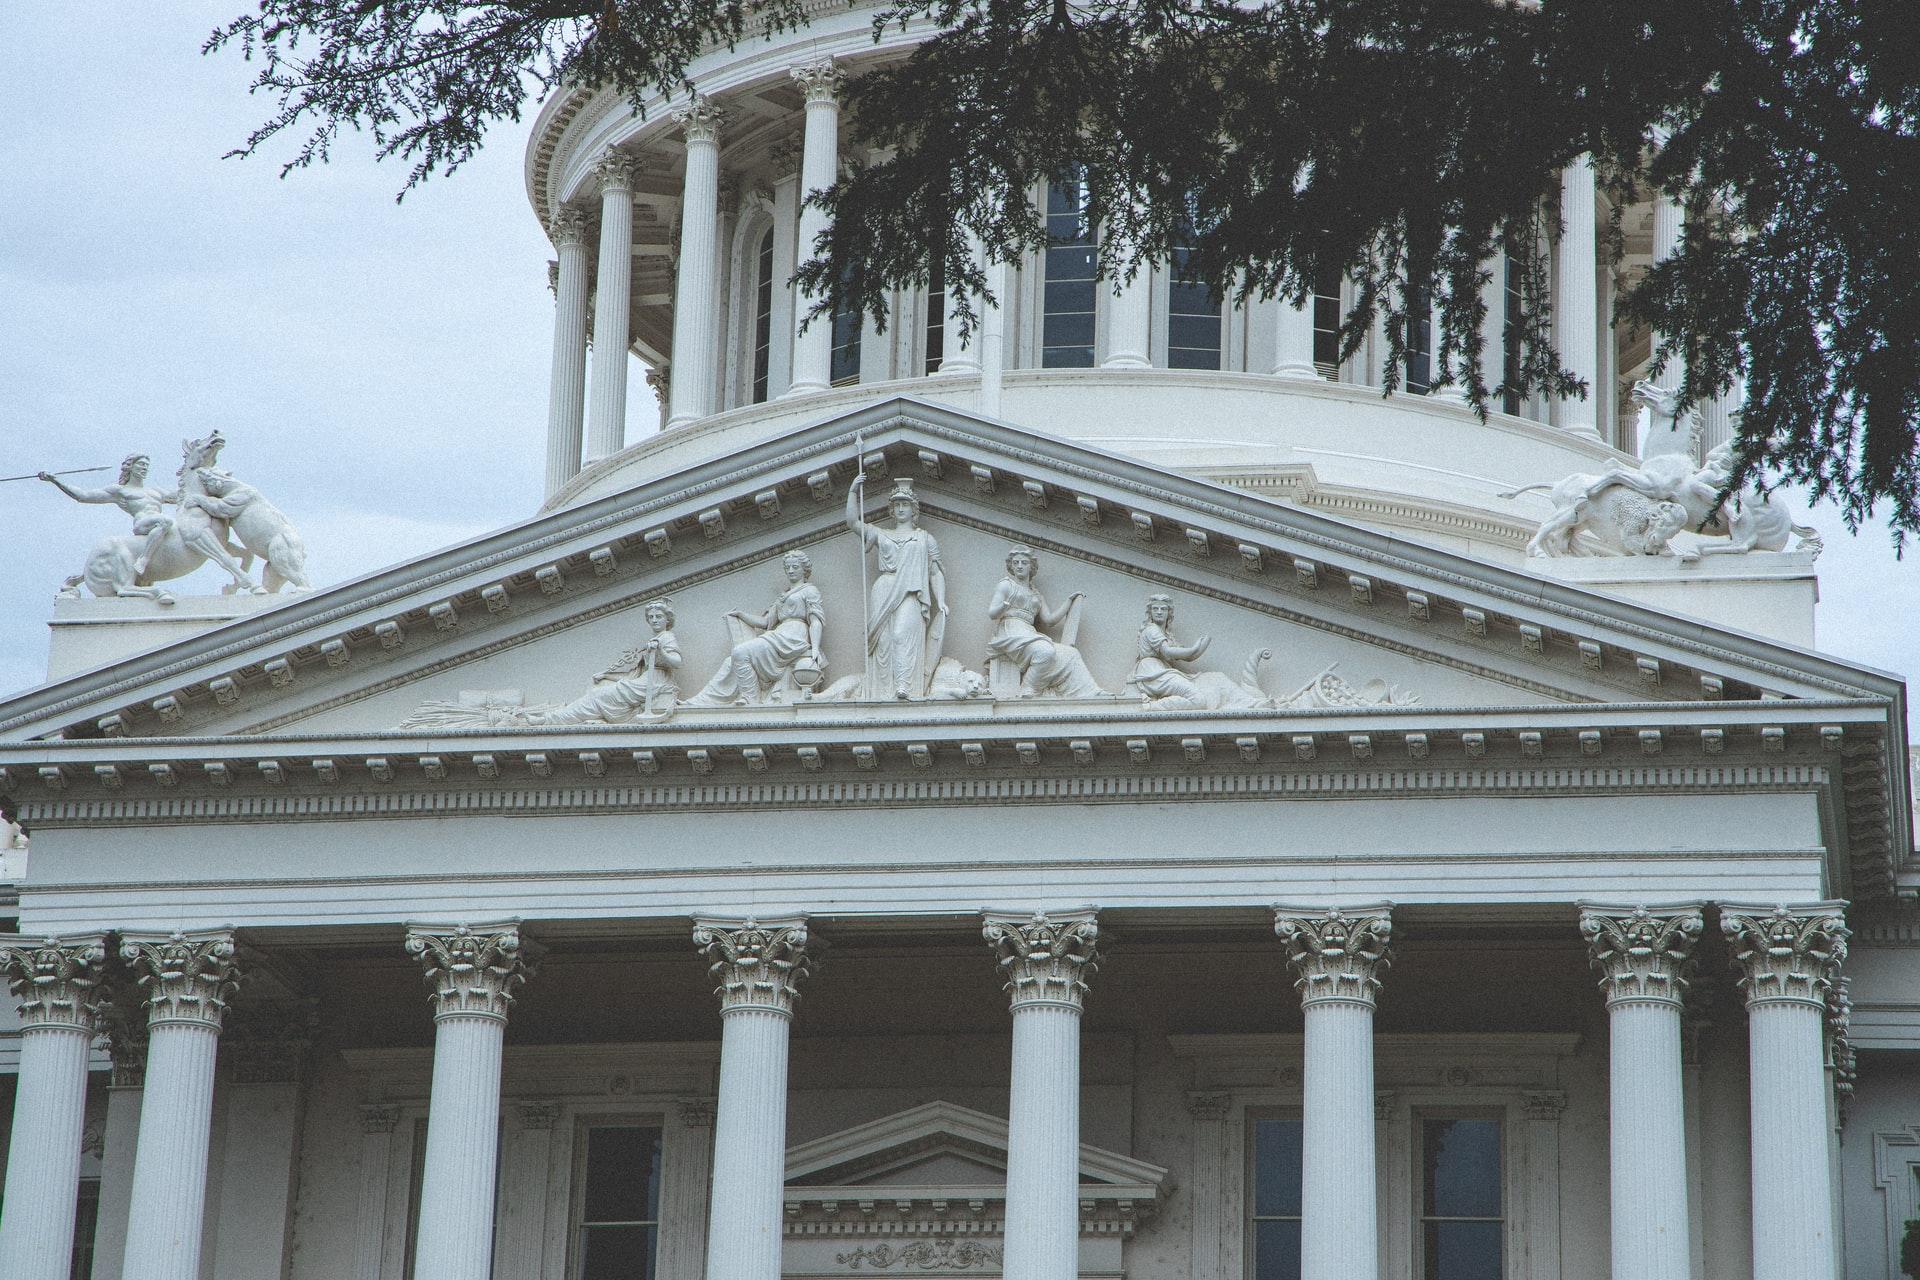 SB 1410 Proposes An Emergency Rental Assistance  Program